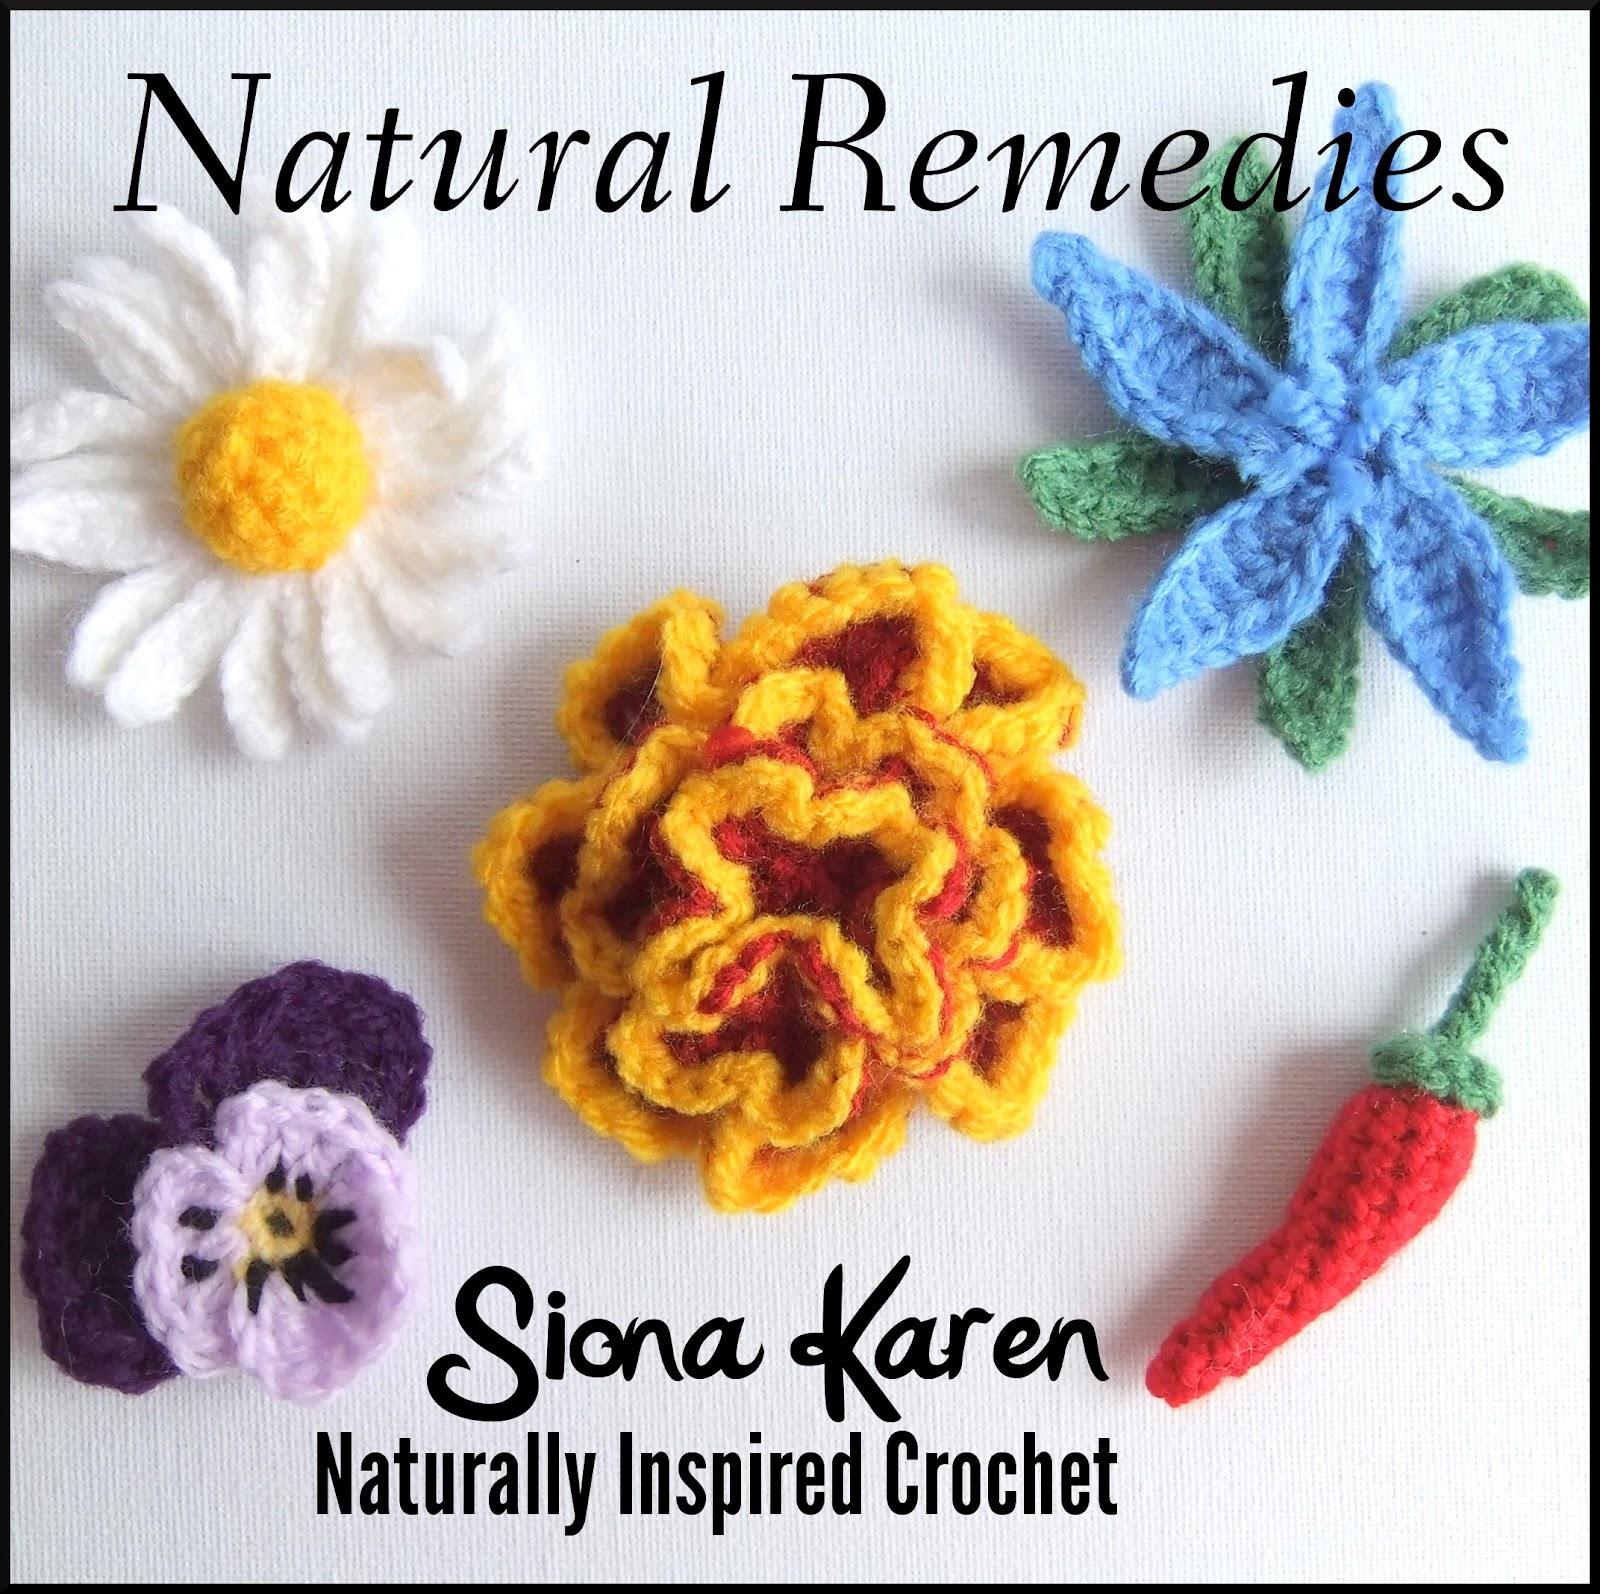 Free Crochet Zingy Pattern : Siona Karen : Crochet Patterns: Natural Remedies ebook